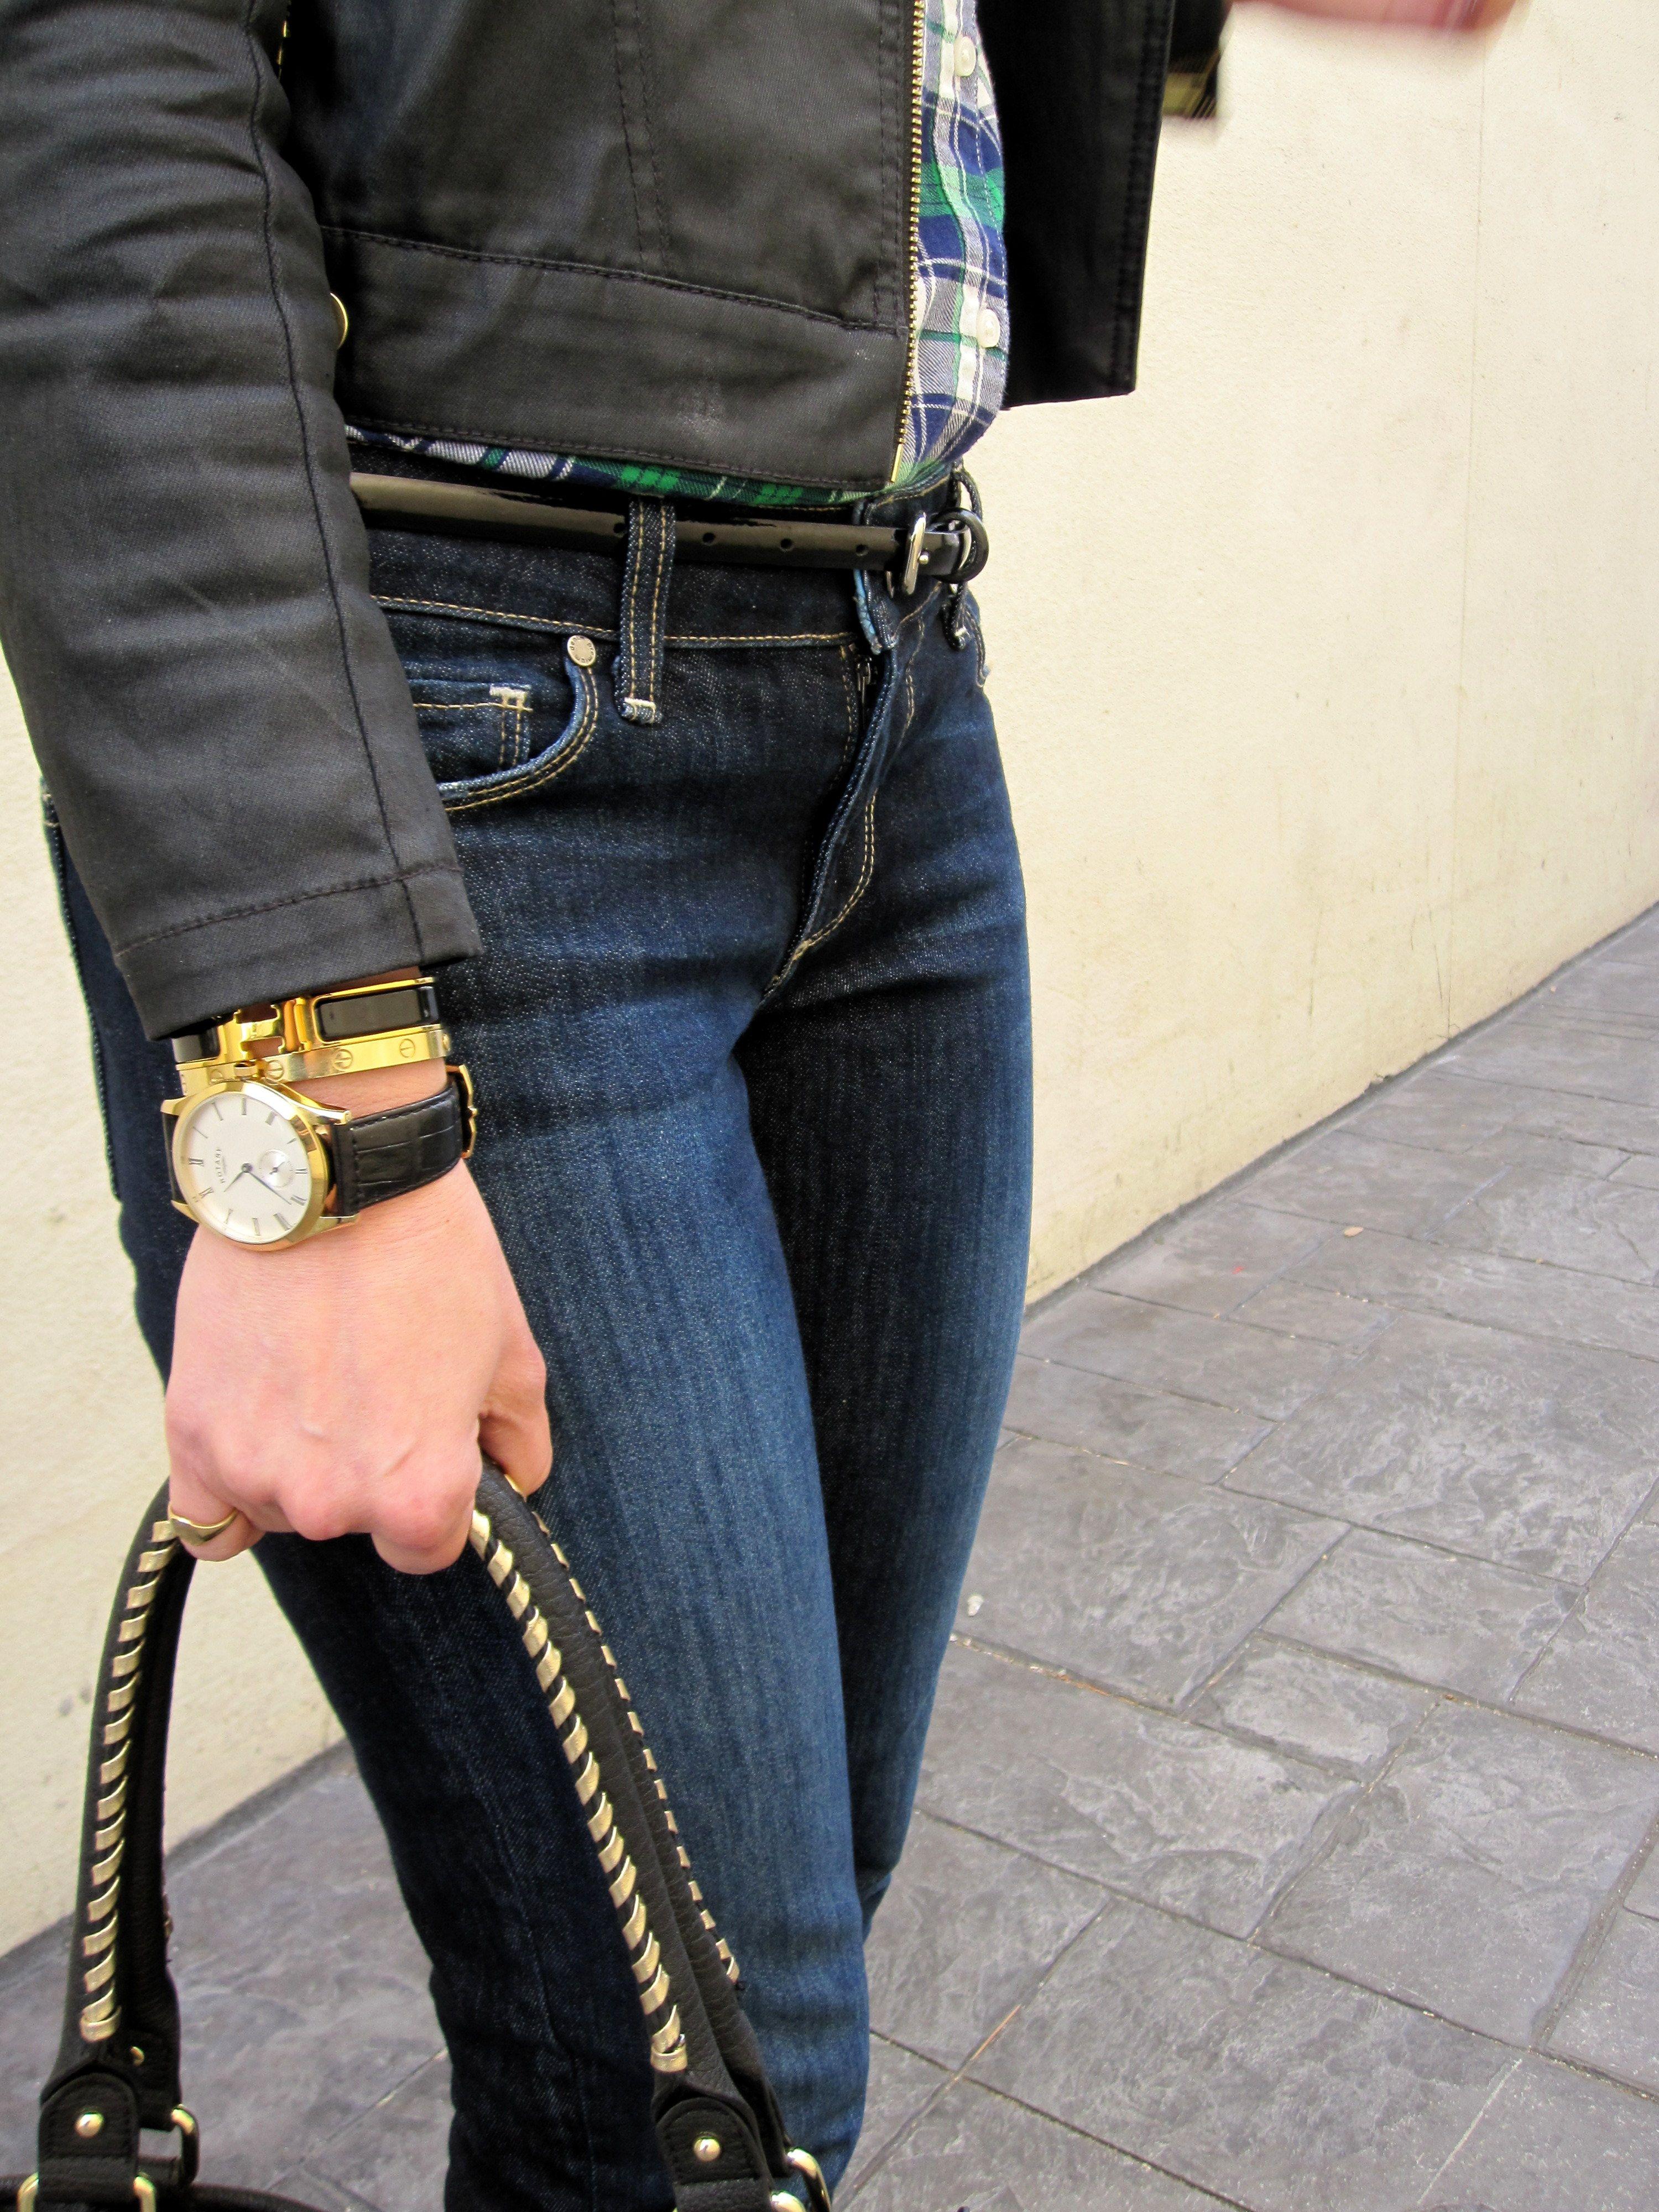 Rotary Mens Watch Black & Gold, Hermes H Clic Bracelet, Cartier Love  Bracelet